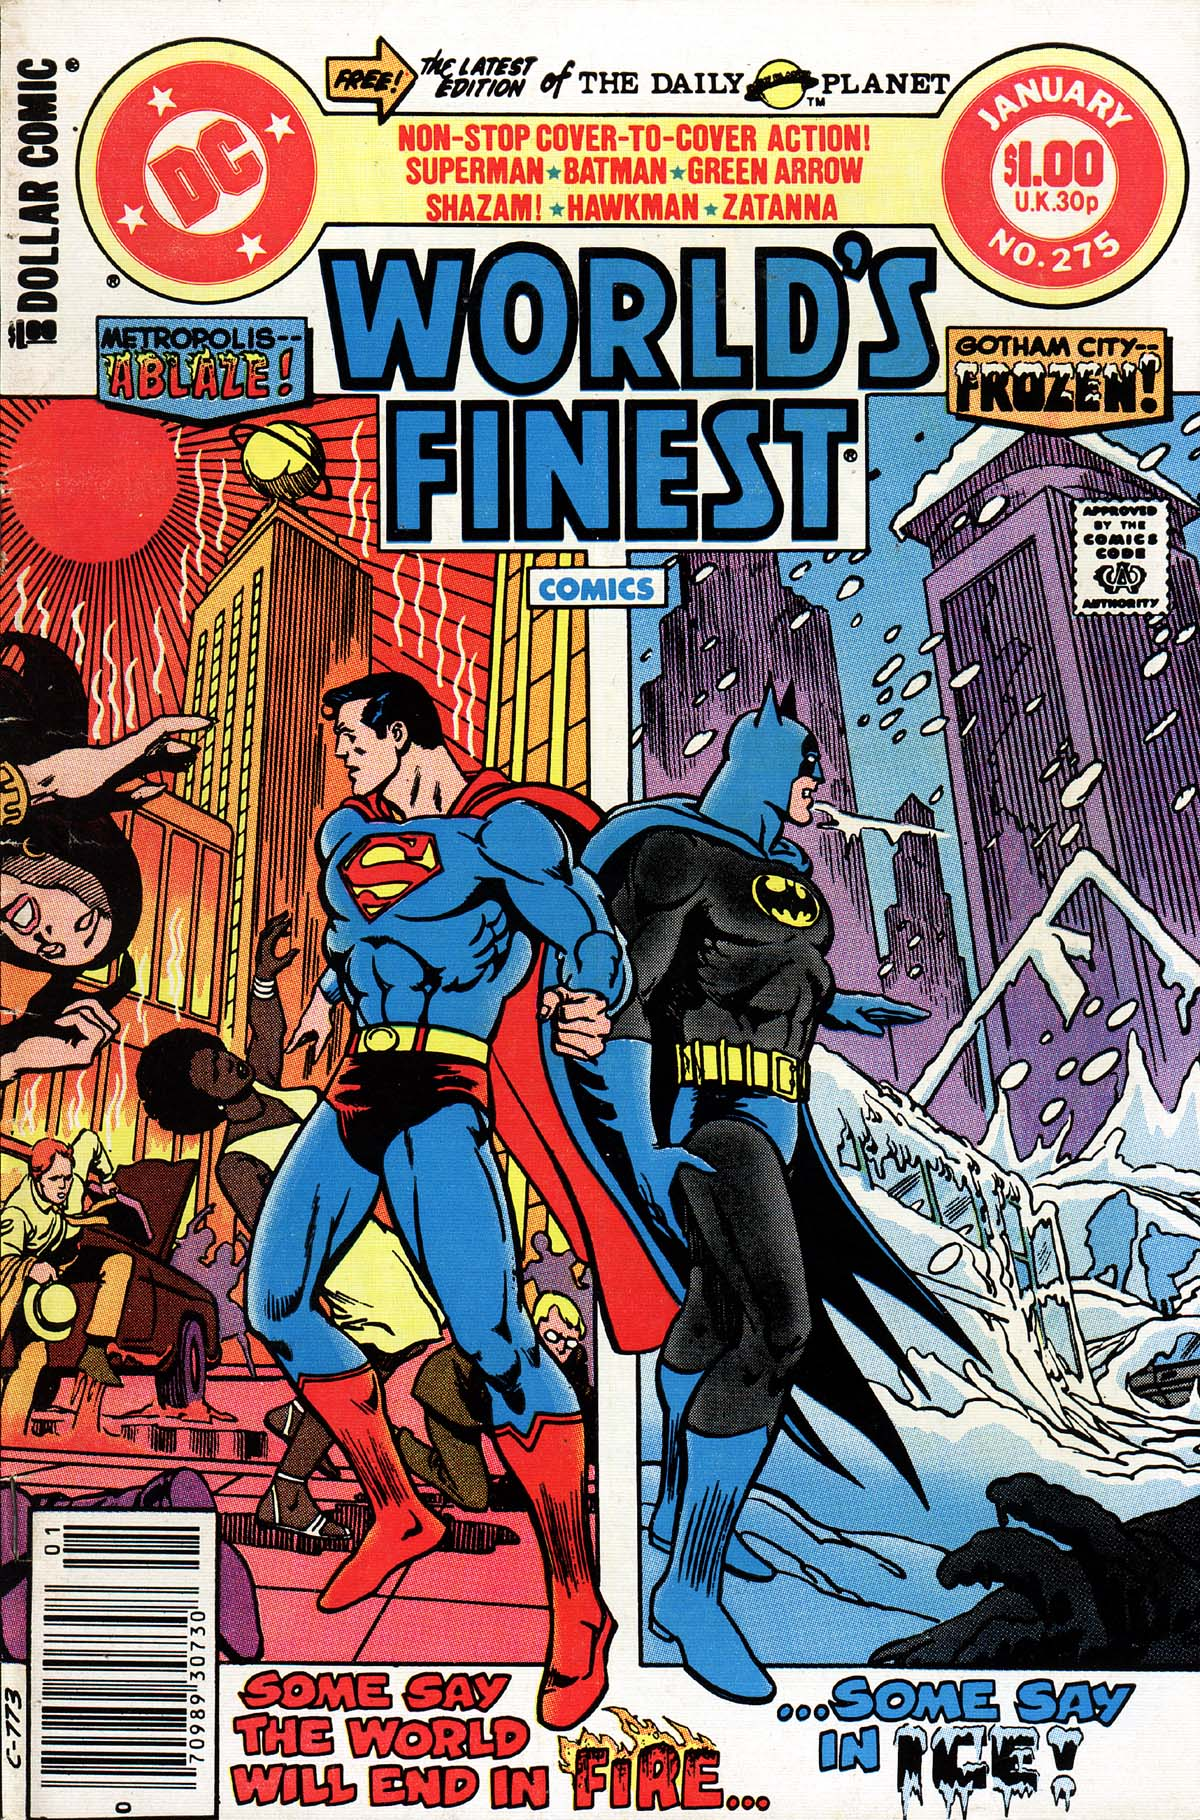 Read online World's Finest Comics comic -  Issue #275 - 1